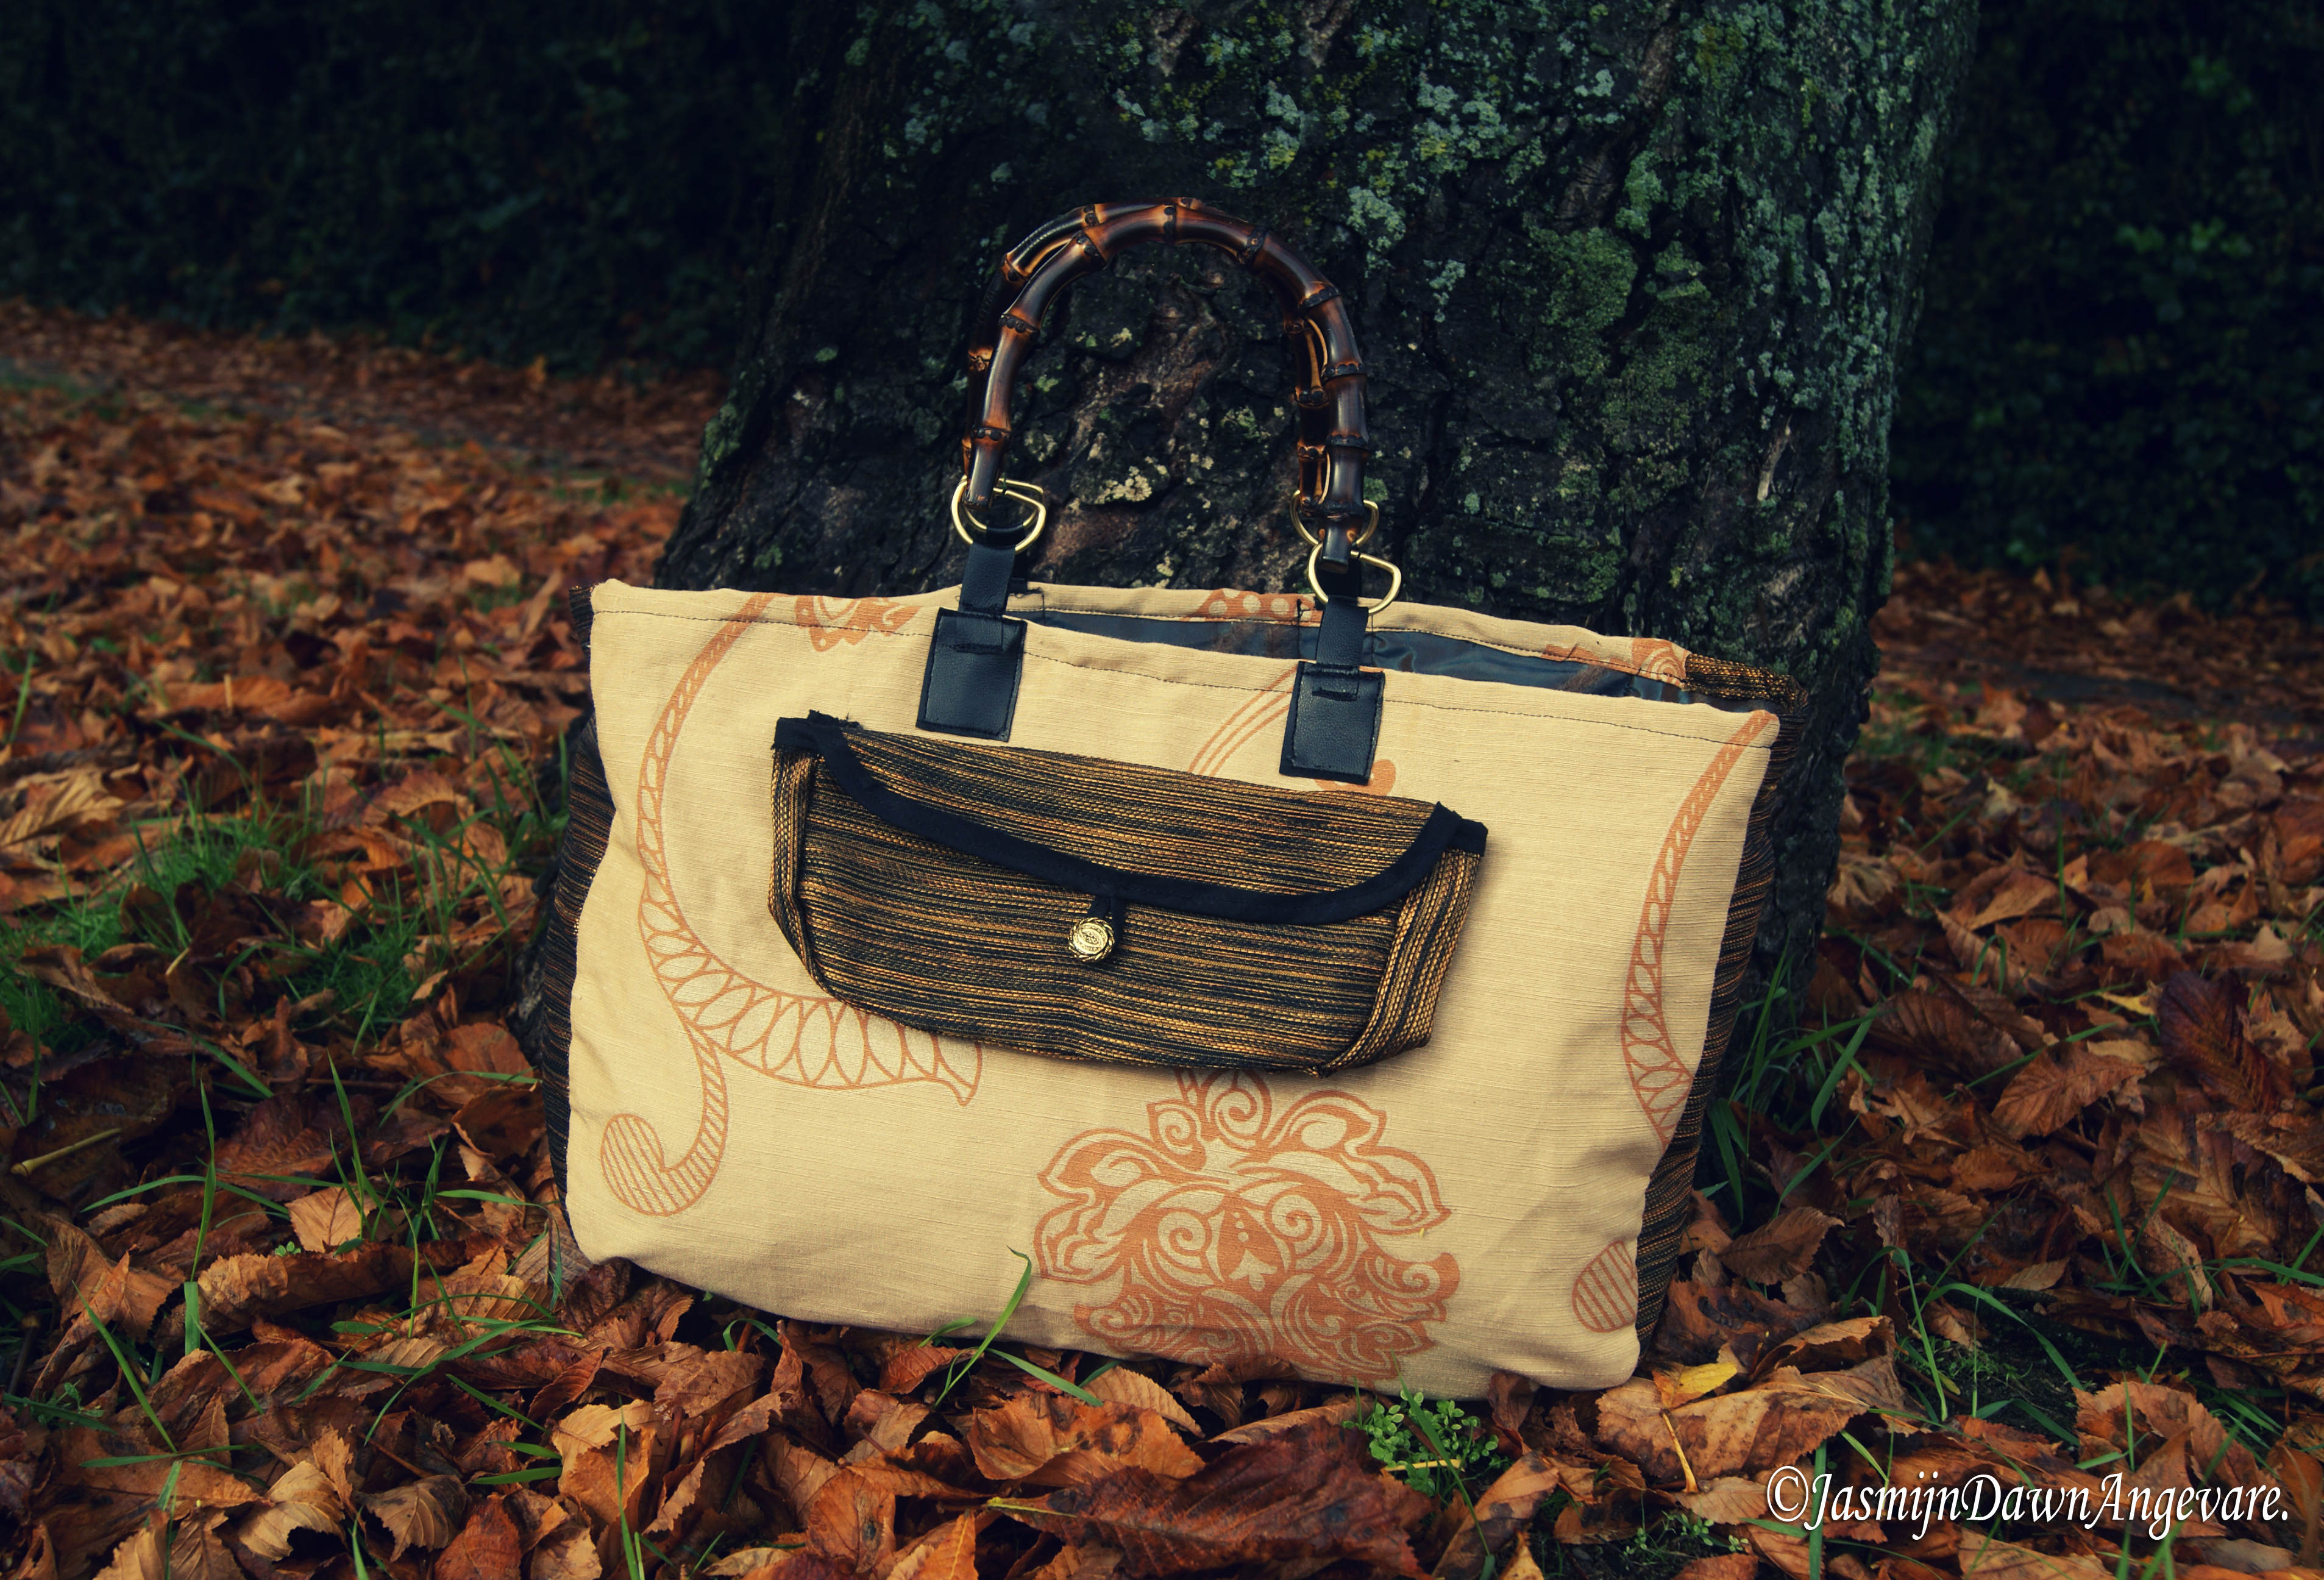 Autumn Bag 2 by JasmijnDawnAngevare